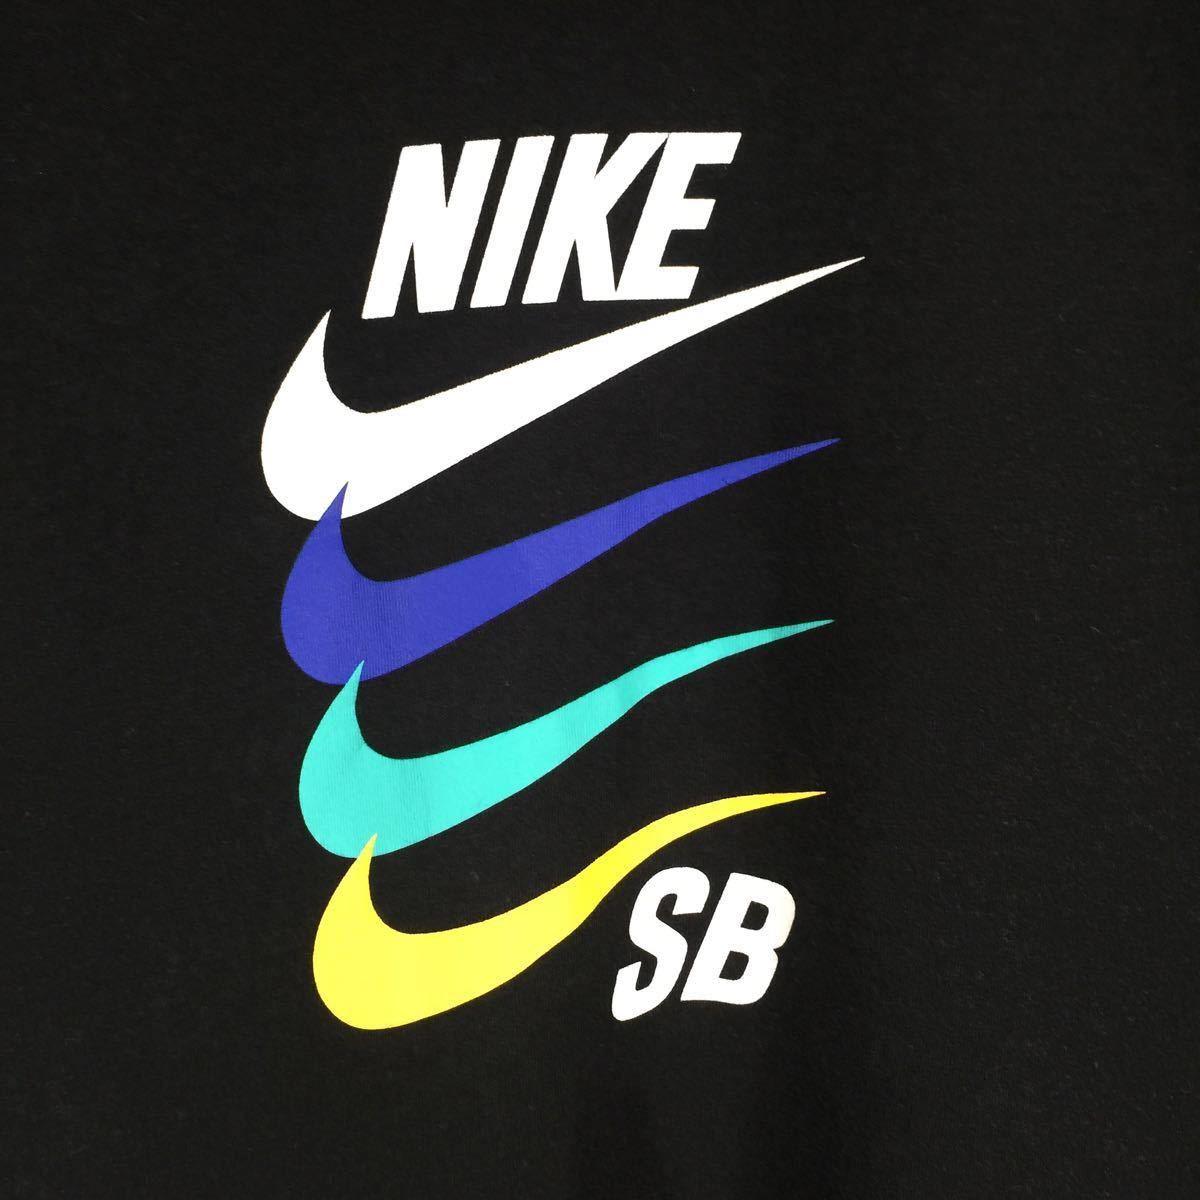 NIKE ナイキ 半袖Tシャツ 4連ロゴ スウッシュ XXL 送料無料